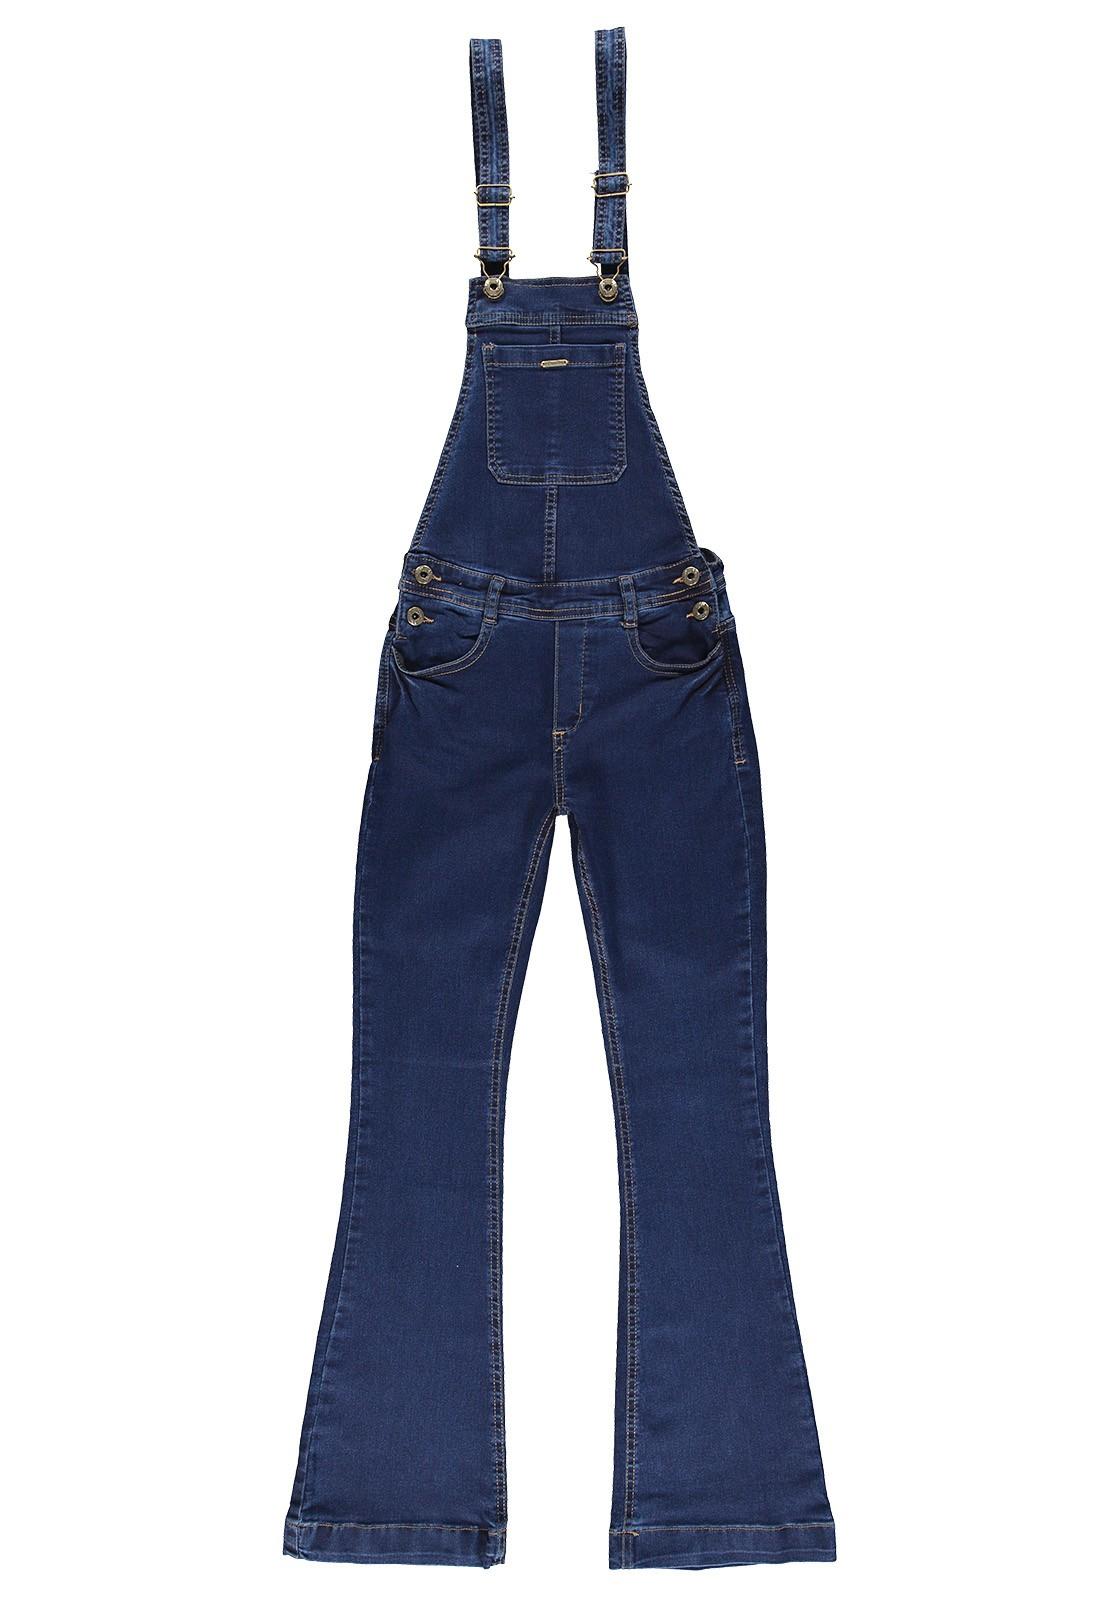 Jardineira Flare Feminina Crawling Jeans